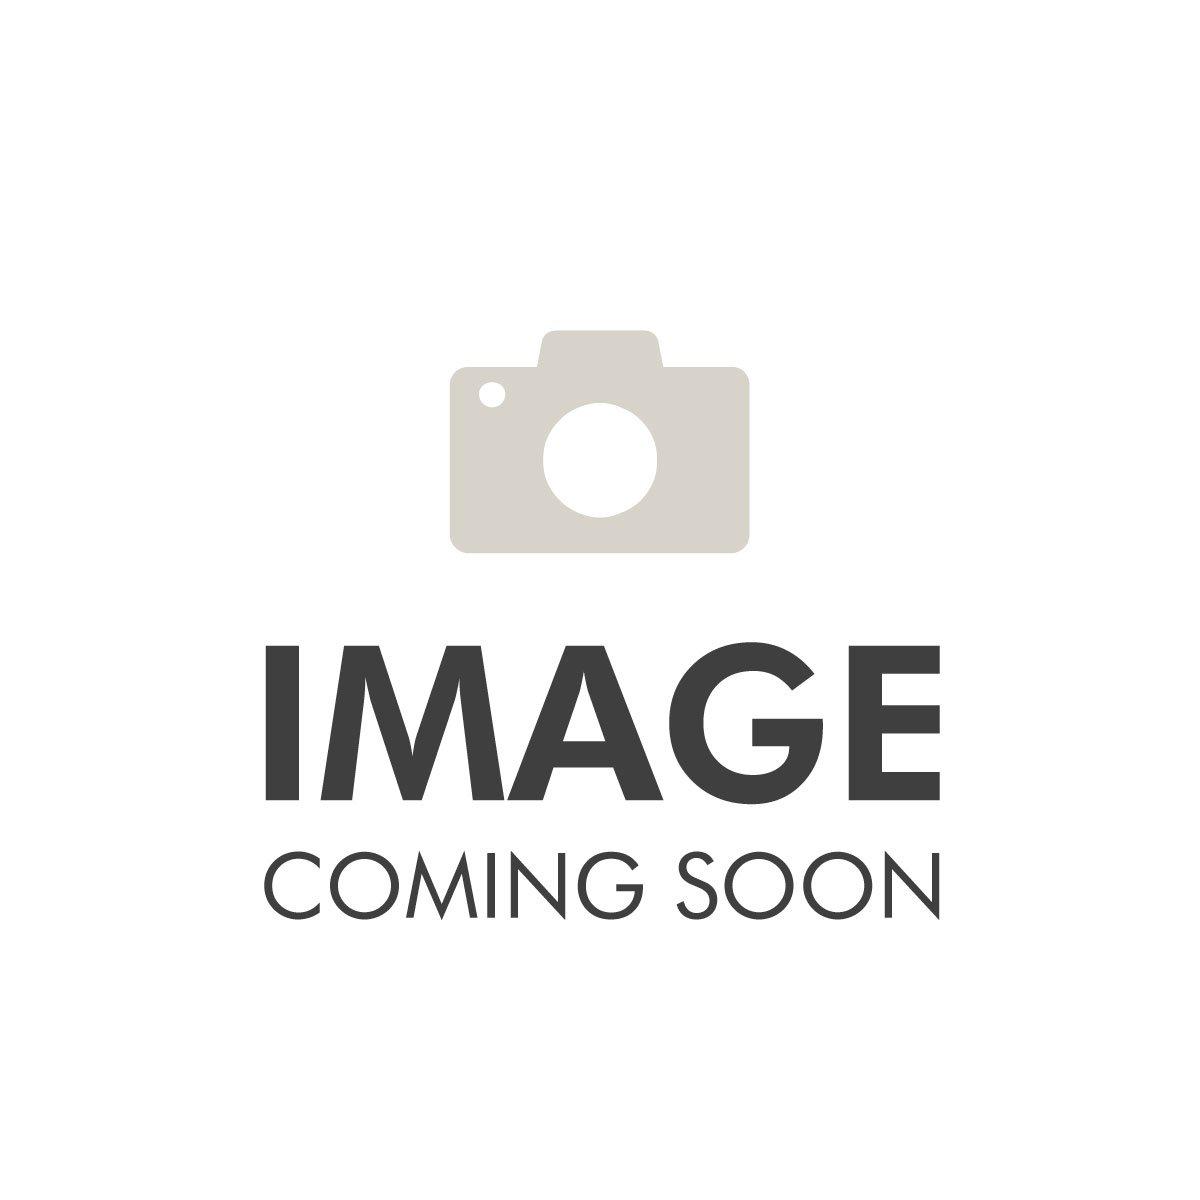 L'Oreal Loreal Pure Clay Detox Mask 50ml